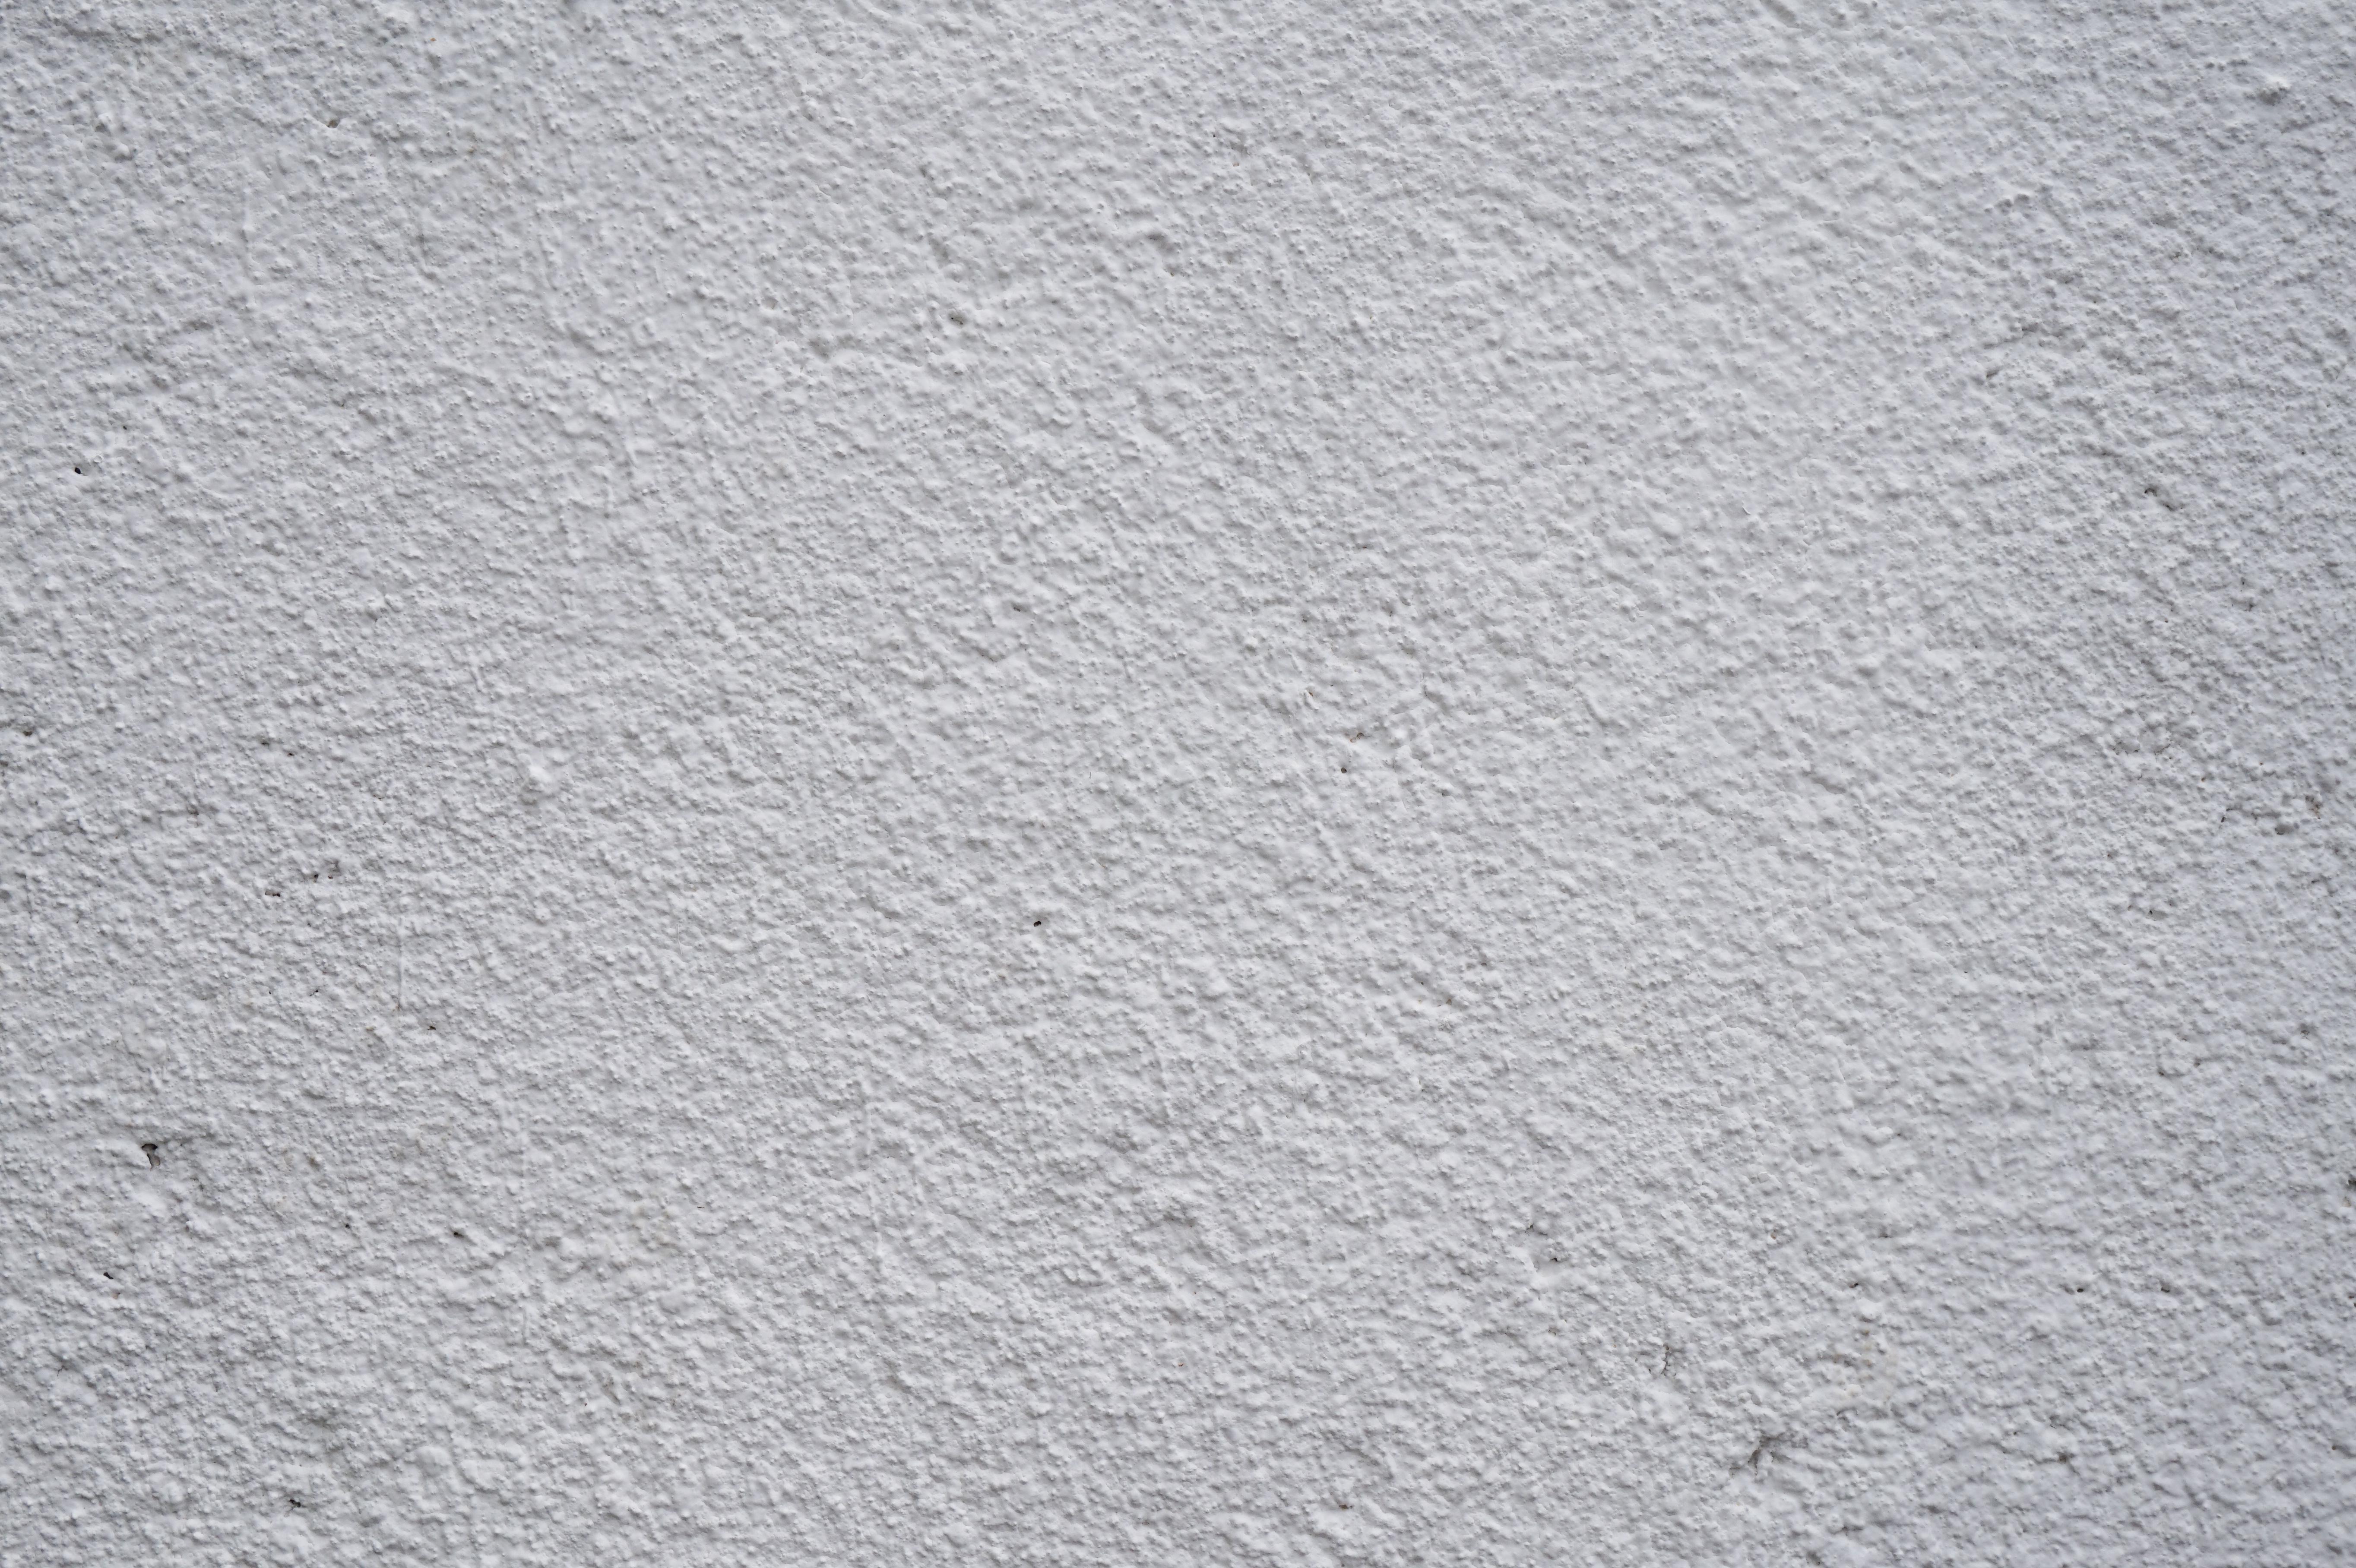 White Plaster Wall 02